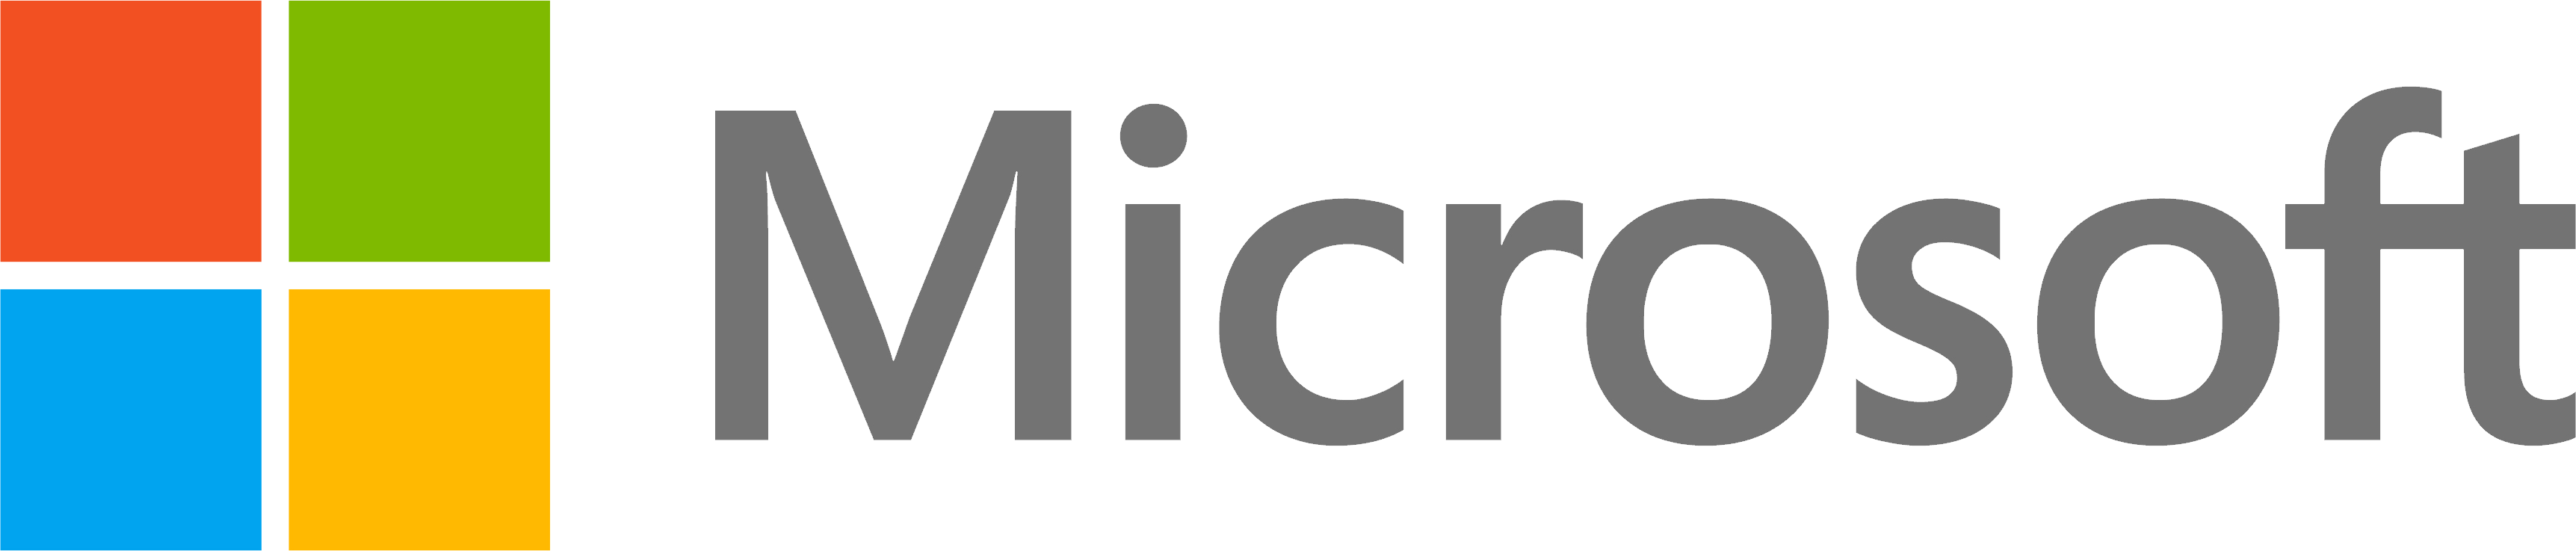 Microsoft UK logo